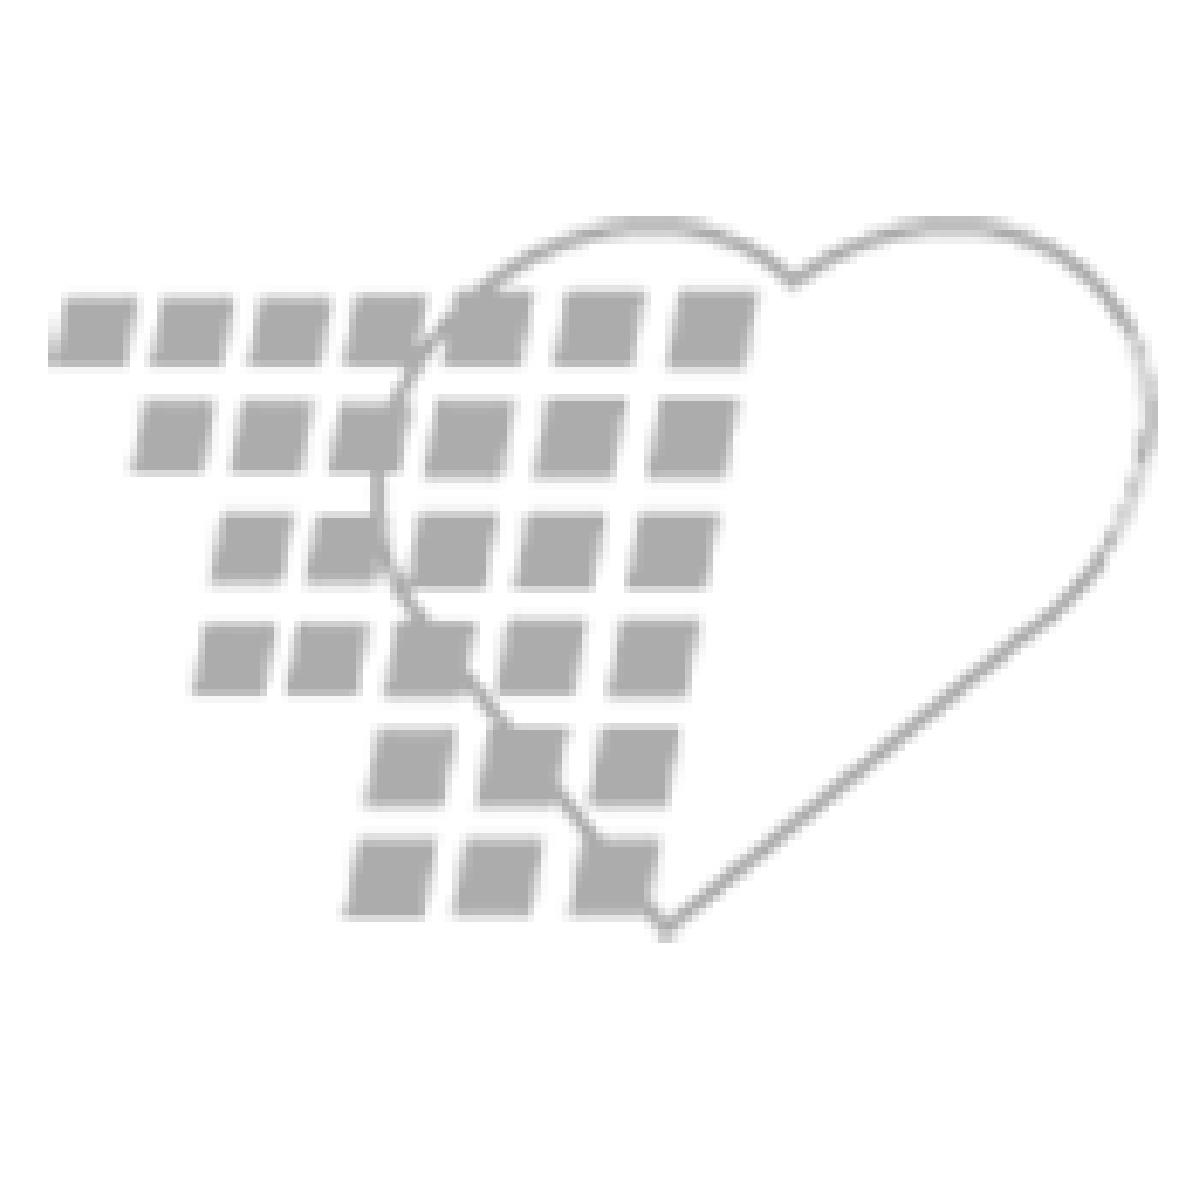 03-75-150 Isolation Gown Standard Polyethylene Thumb Loop